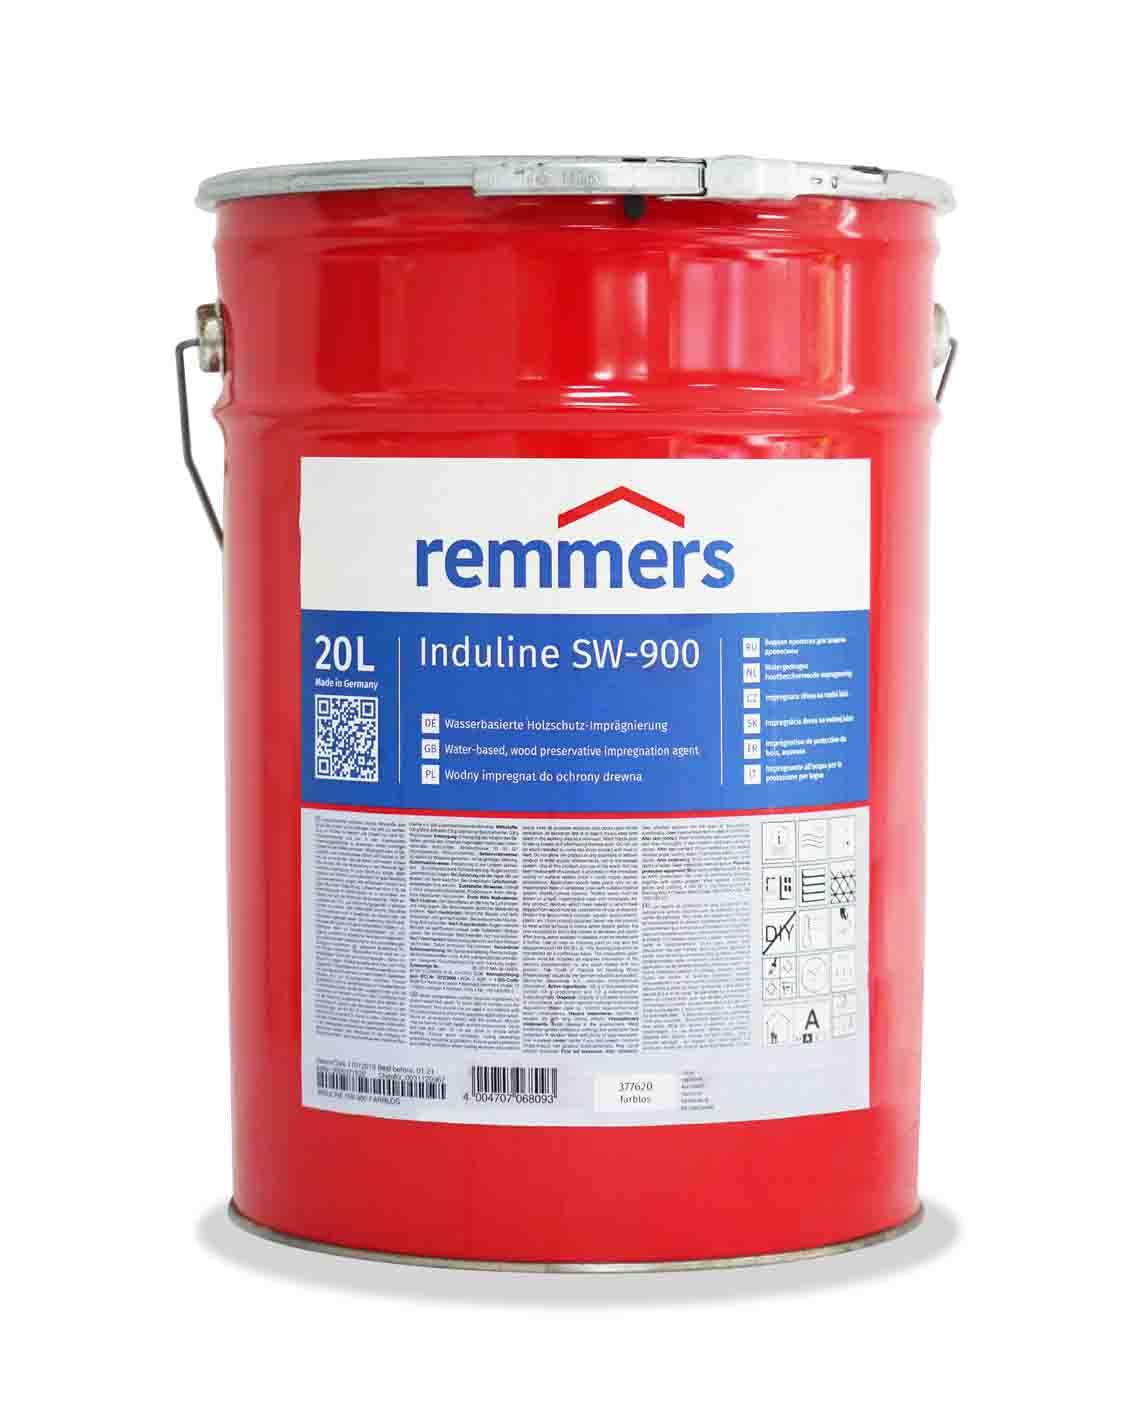 remmers-Induline SW-900 姘存�у�婕�